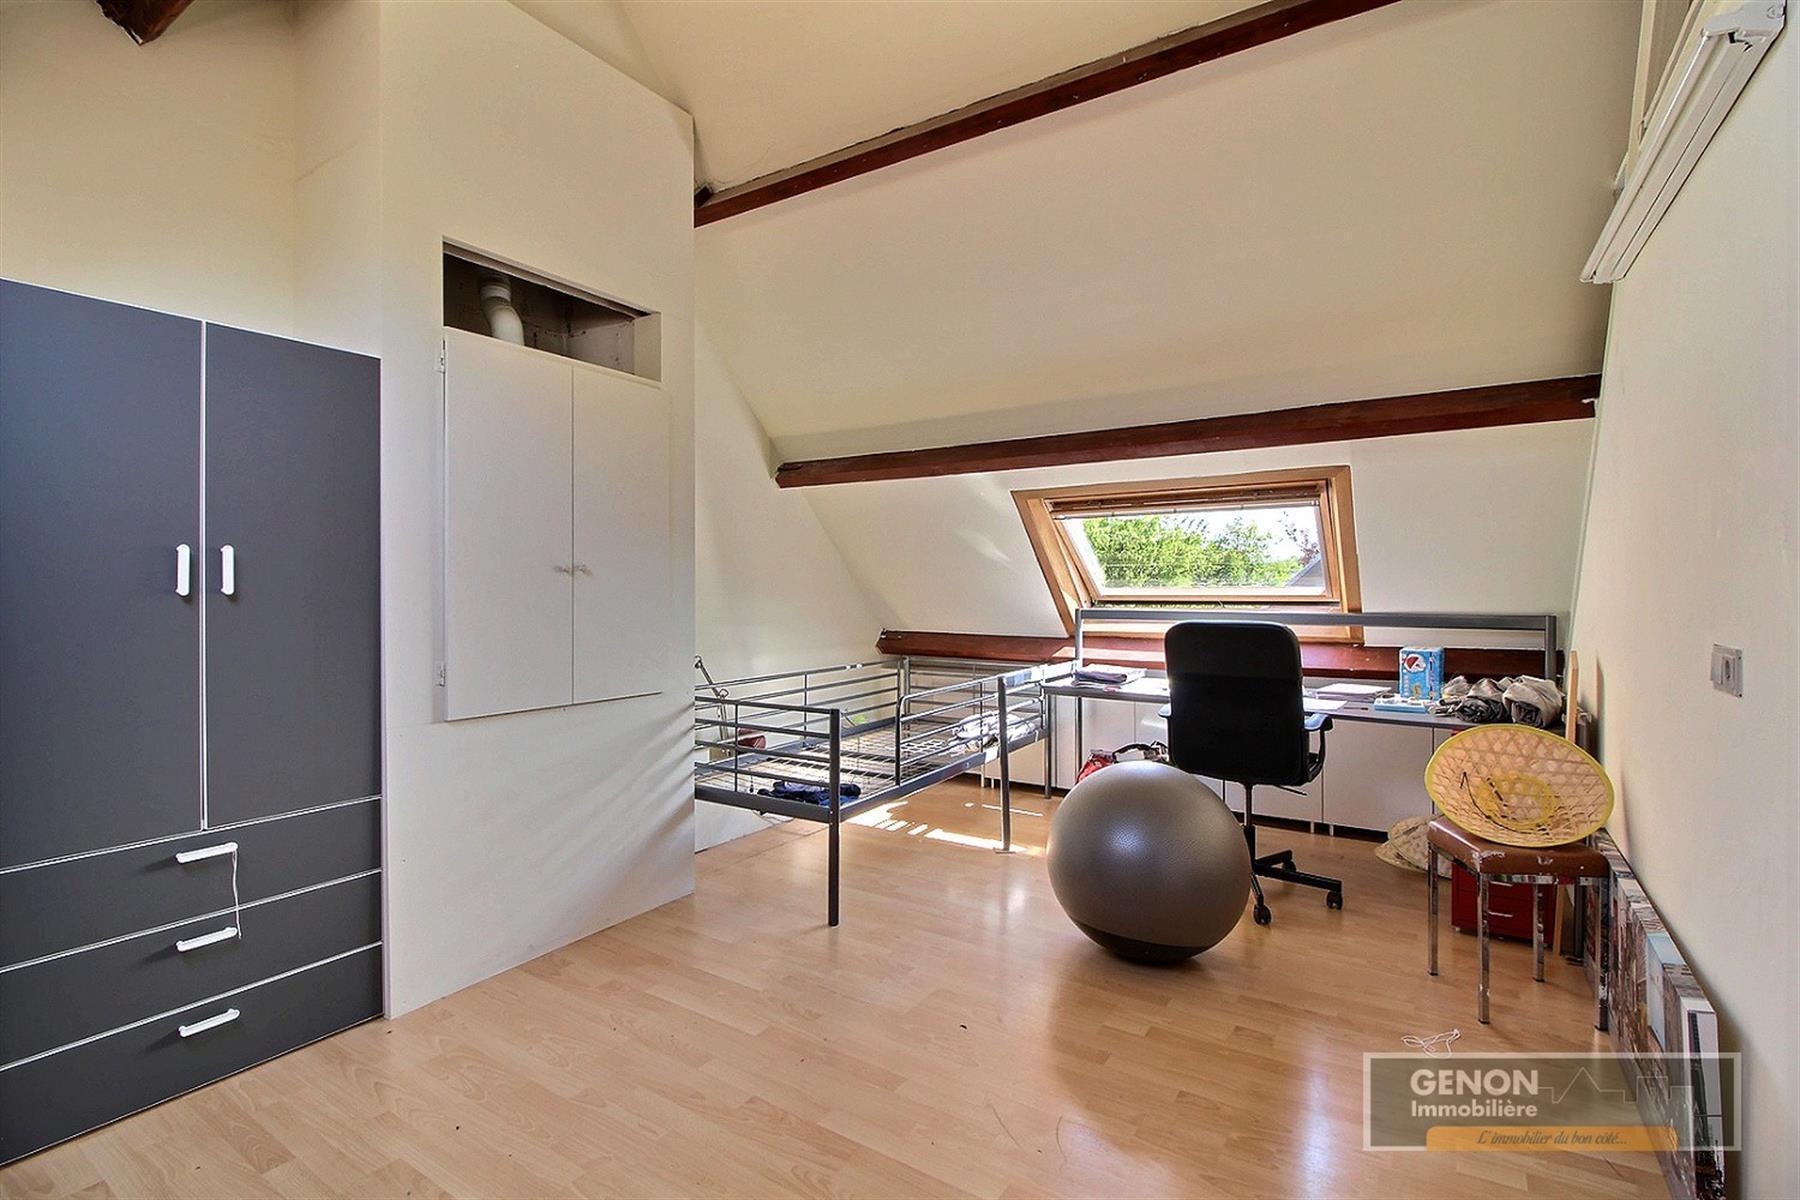 Maison - Ottignies-Louvain-la-Neuve Louvain-la-Neuve - #4246829-6